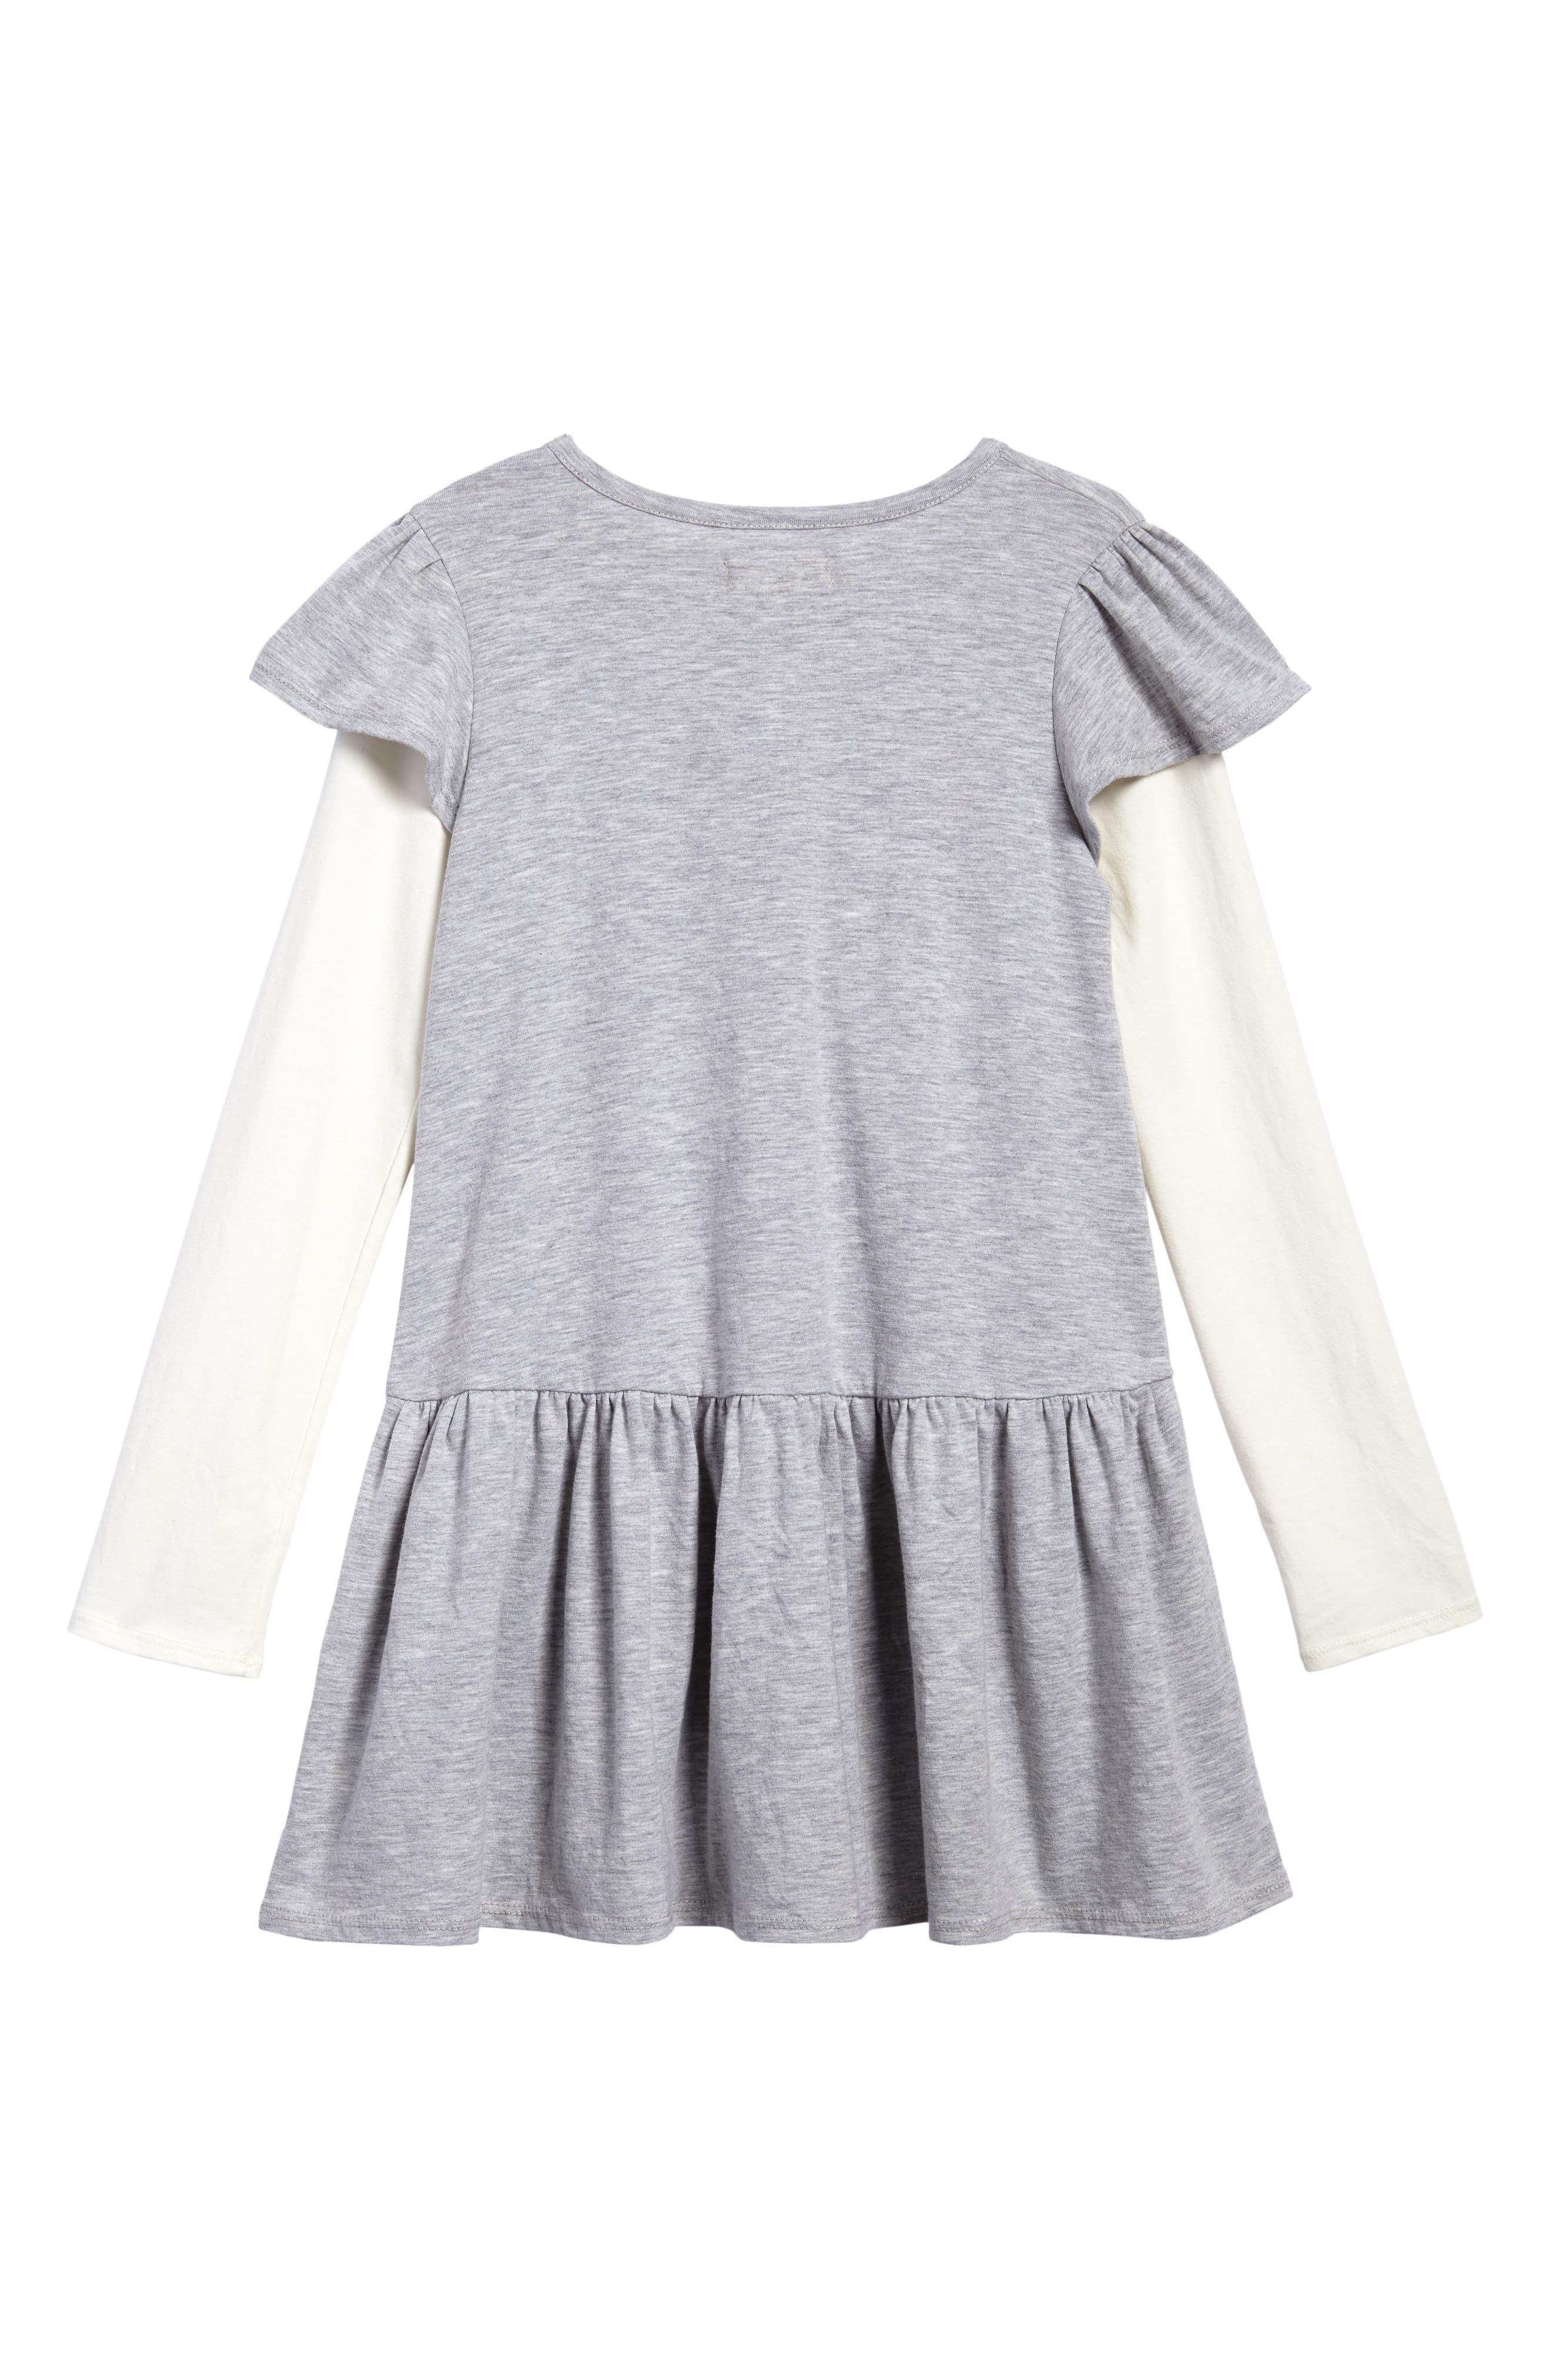 Flutter Sleeve Knit Dress,                             Alternate thumbnail 2, color,                             Grey Ash Heather Nice